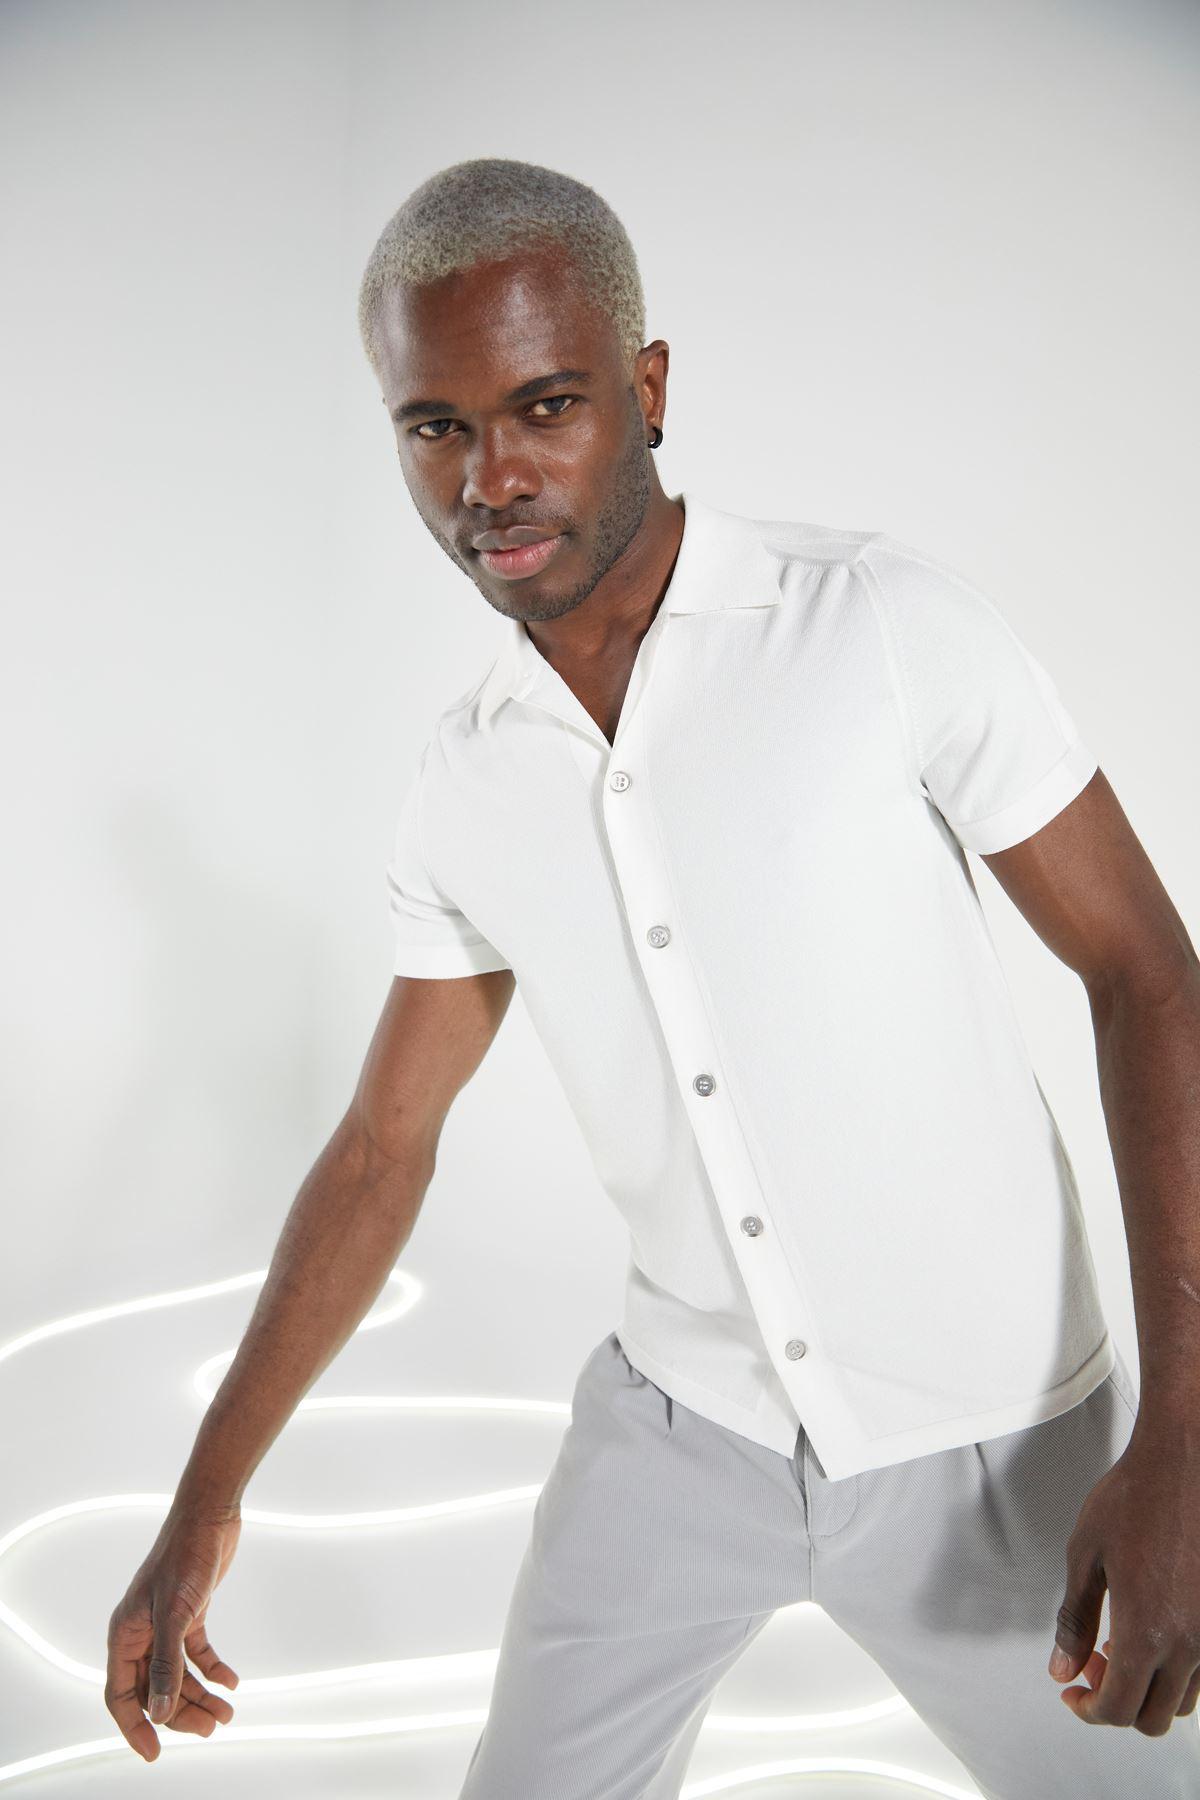 Ekru Gömlek Yaka Düğmeli Triko Kısakol Tshirt